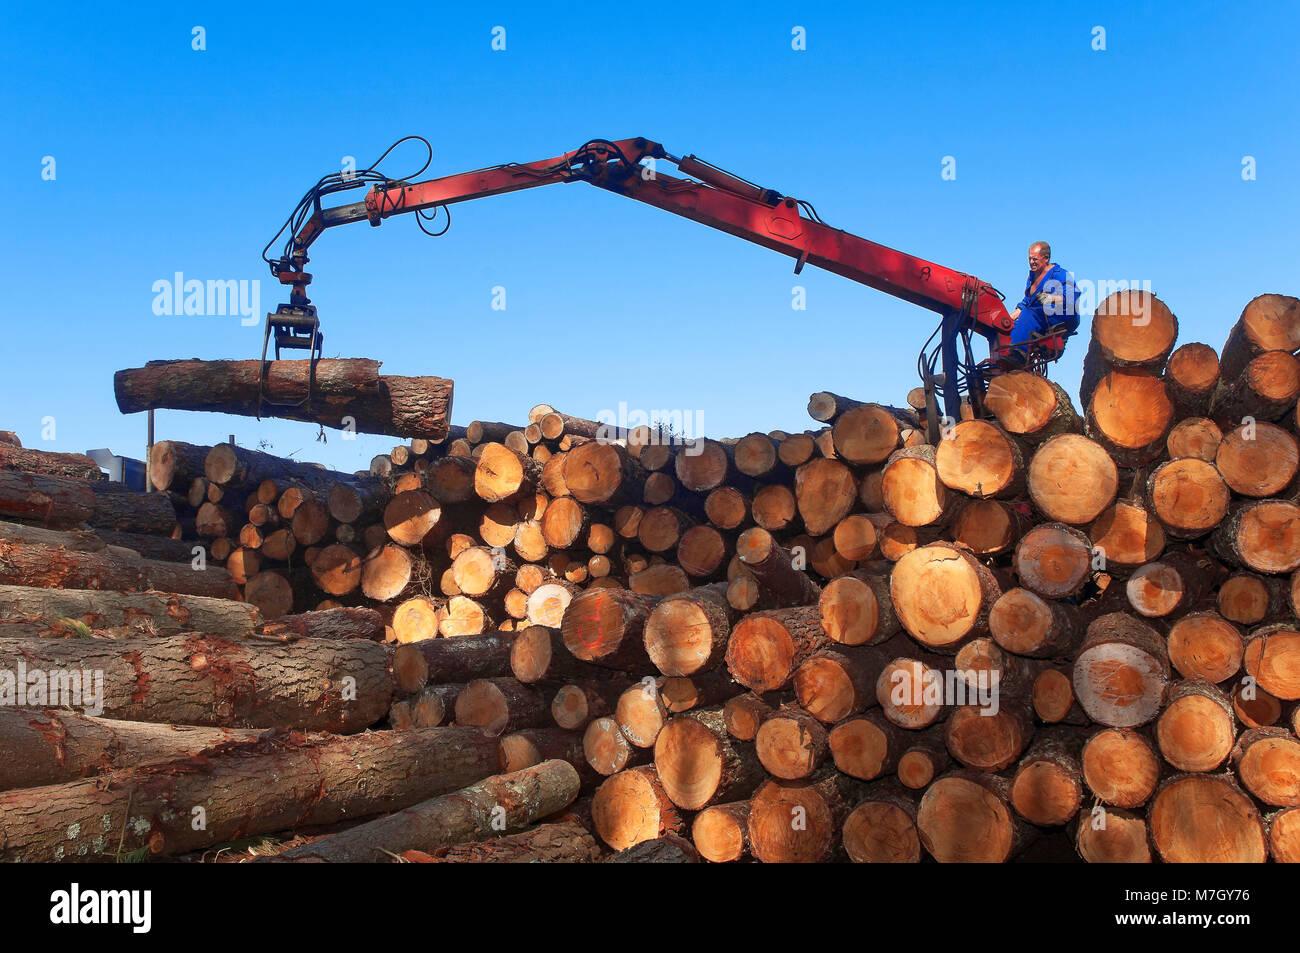 Wood industry, Morpeguite, Muxia, La Coruña province, Region of Galicia, Spain, Europe - Stock Image